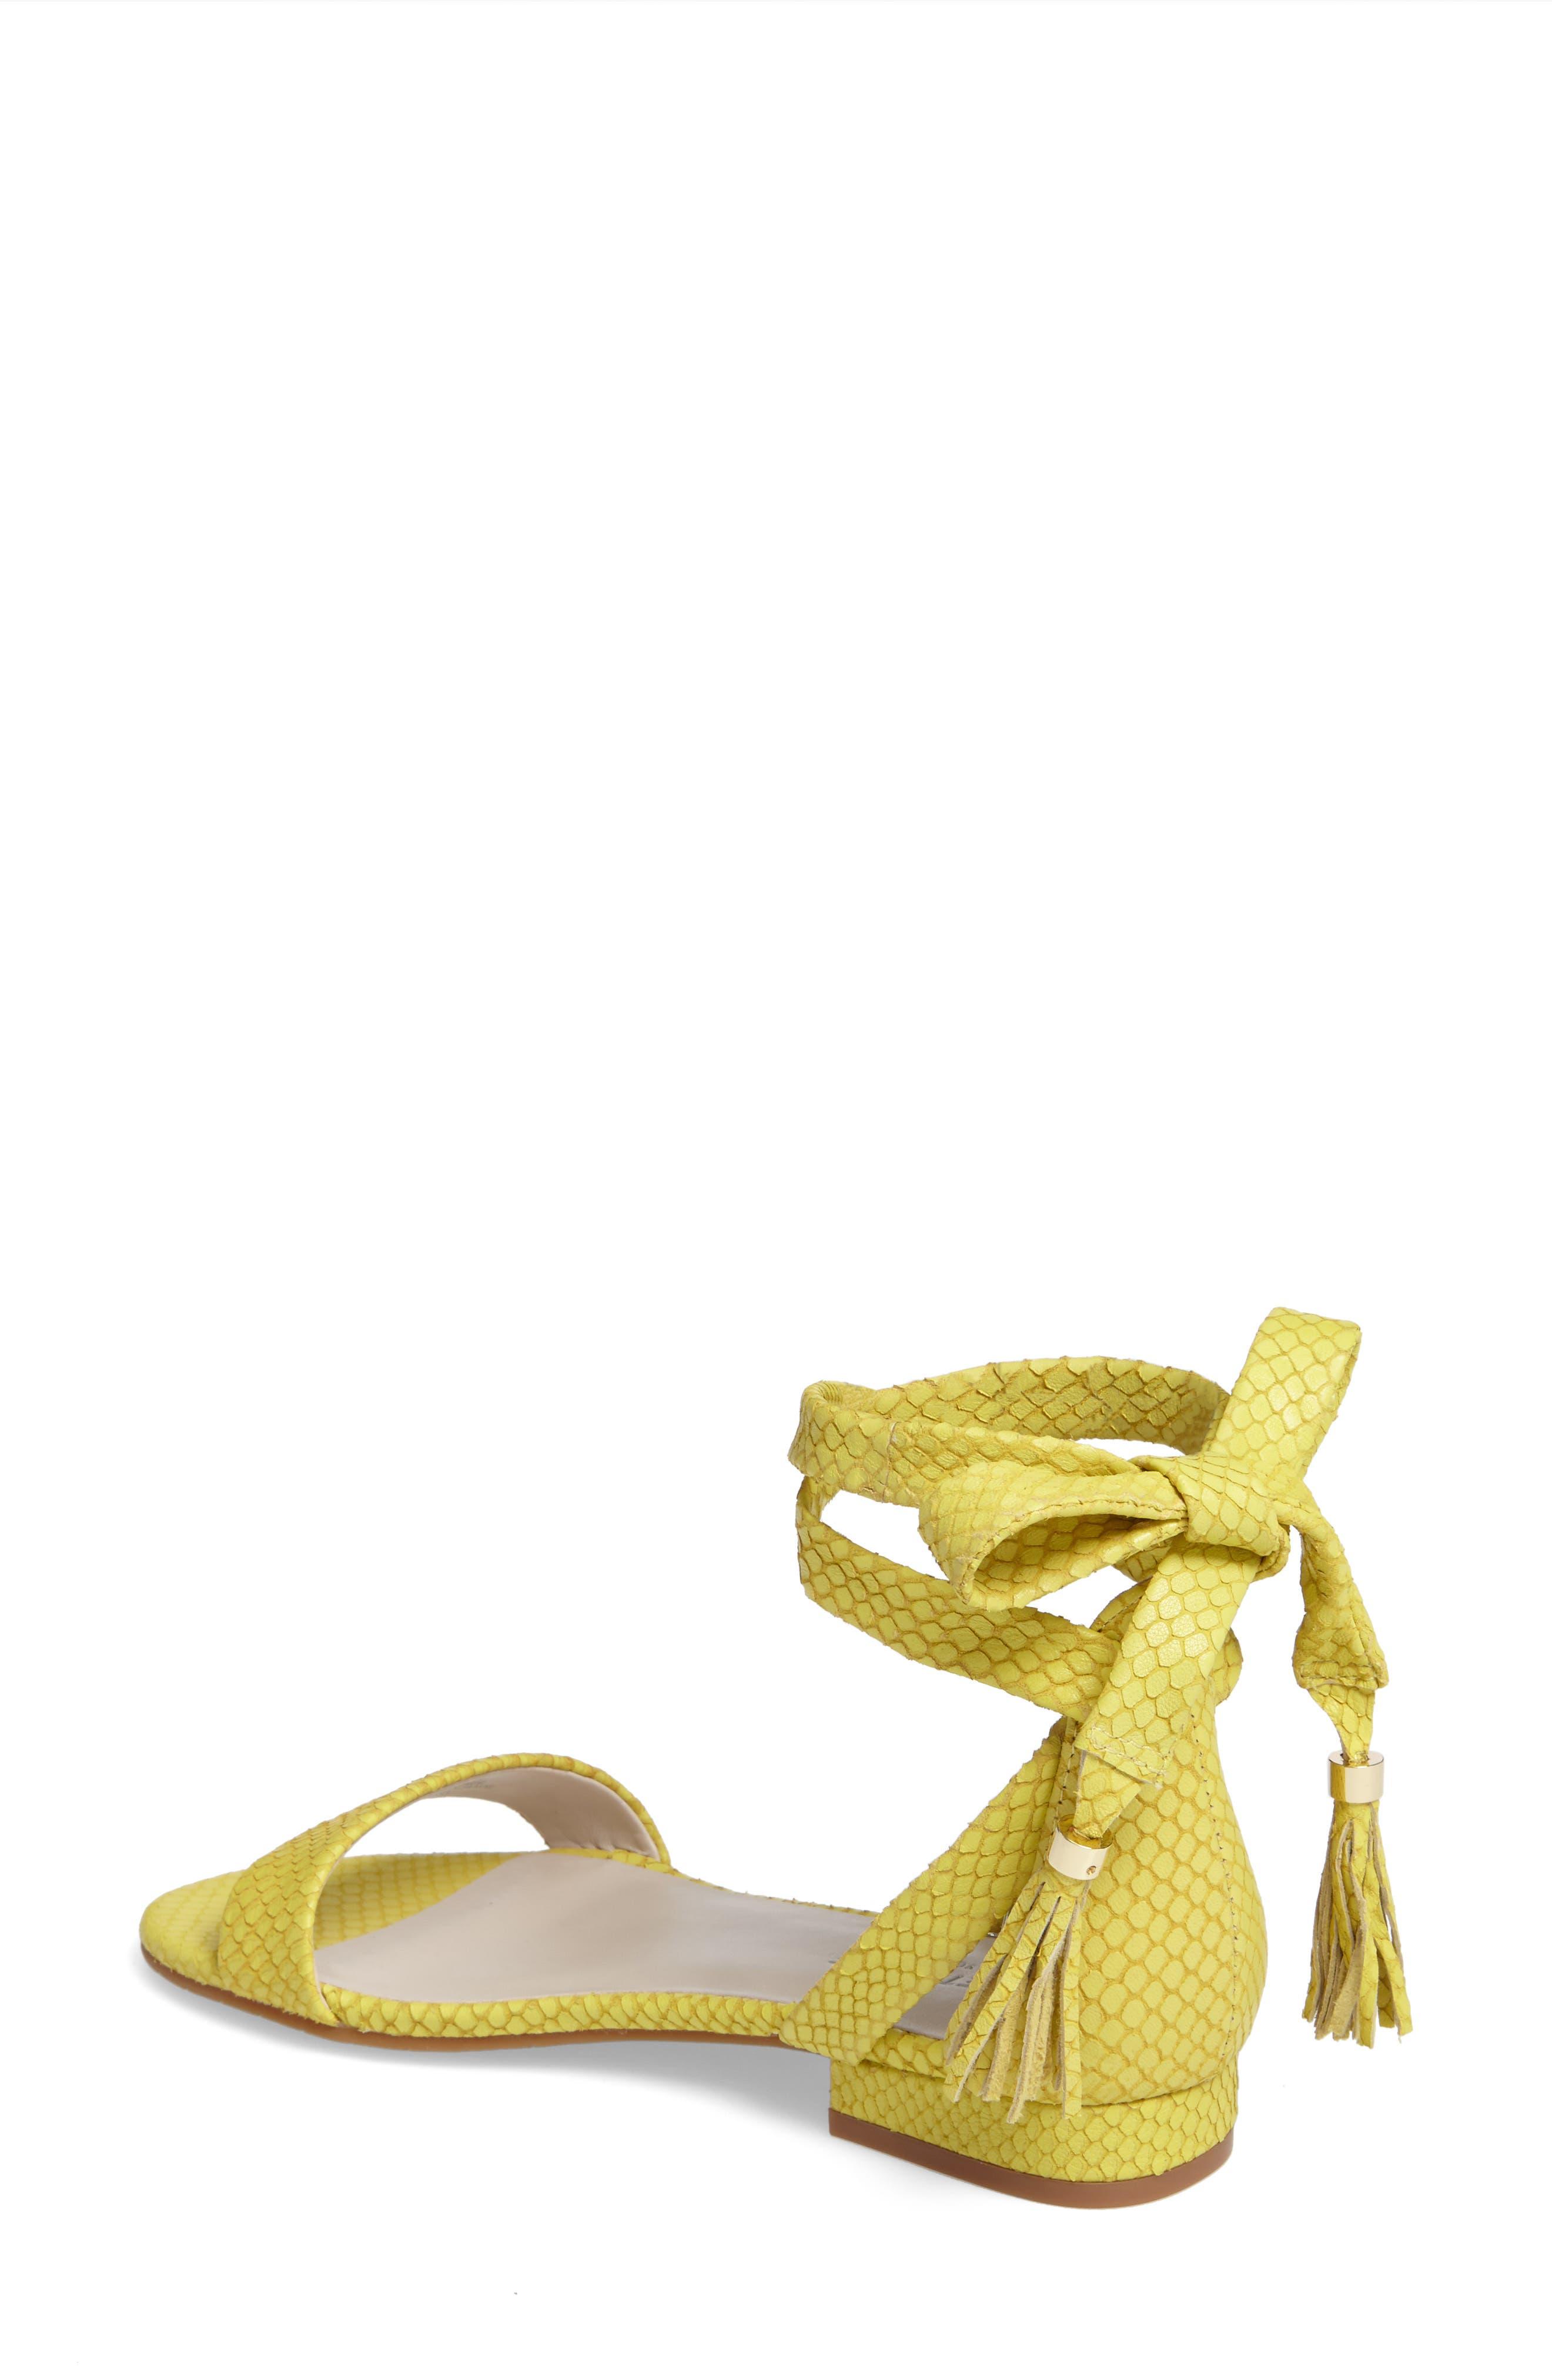 Valen Tassel Lace-Up Sandal,                             Alternate thumbnail 28, color,